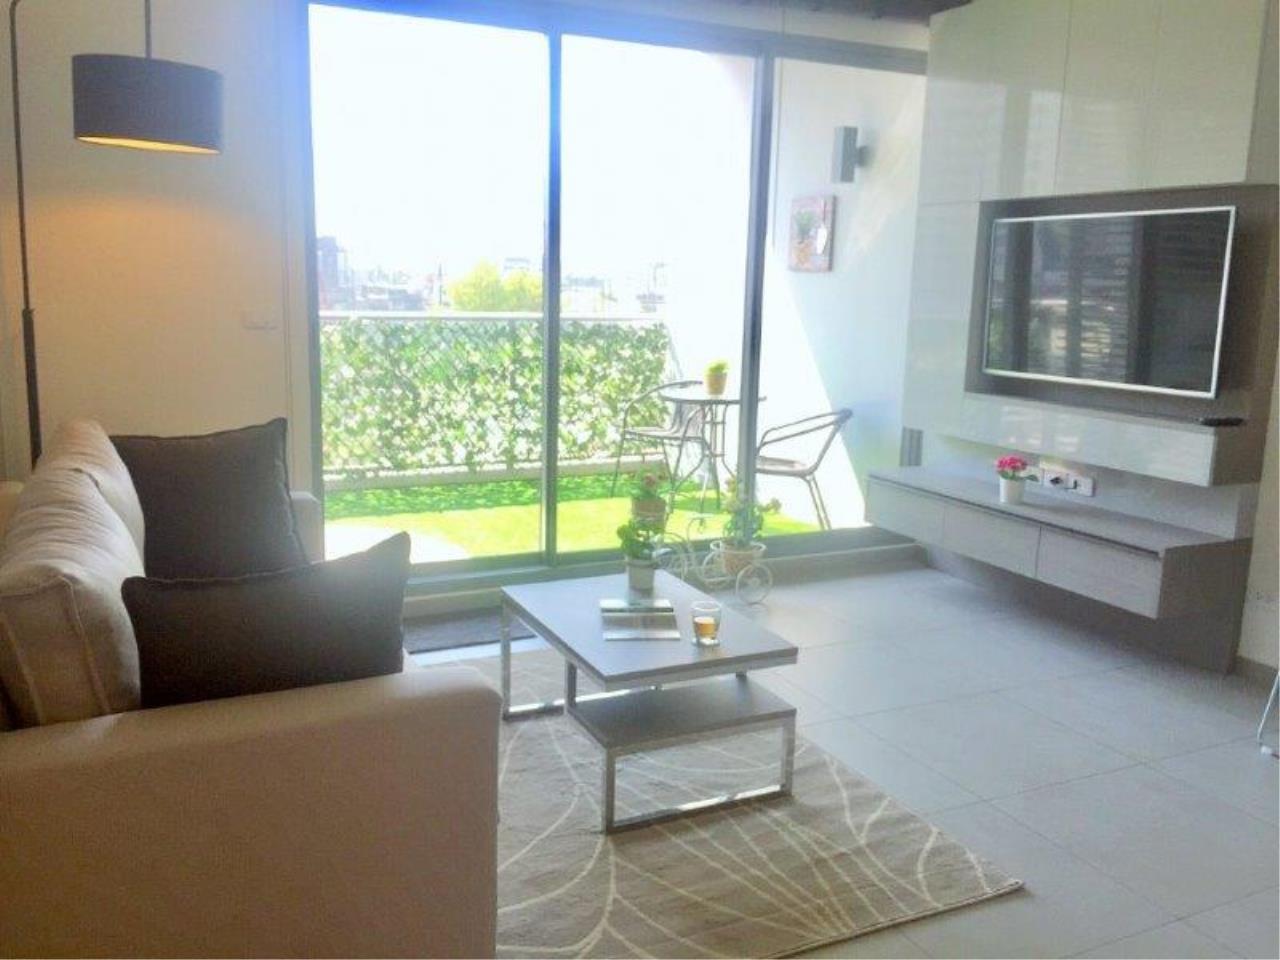 Century21 Skylux Agency's The Lofts Ekkamai / Condo For Sale / 1 Bedroom / 51 SQM / BTS Ekkamai / Bangkok 1